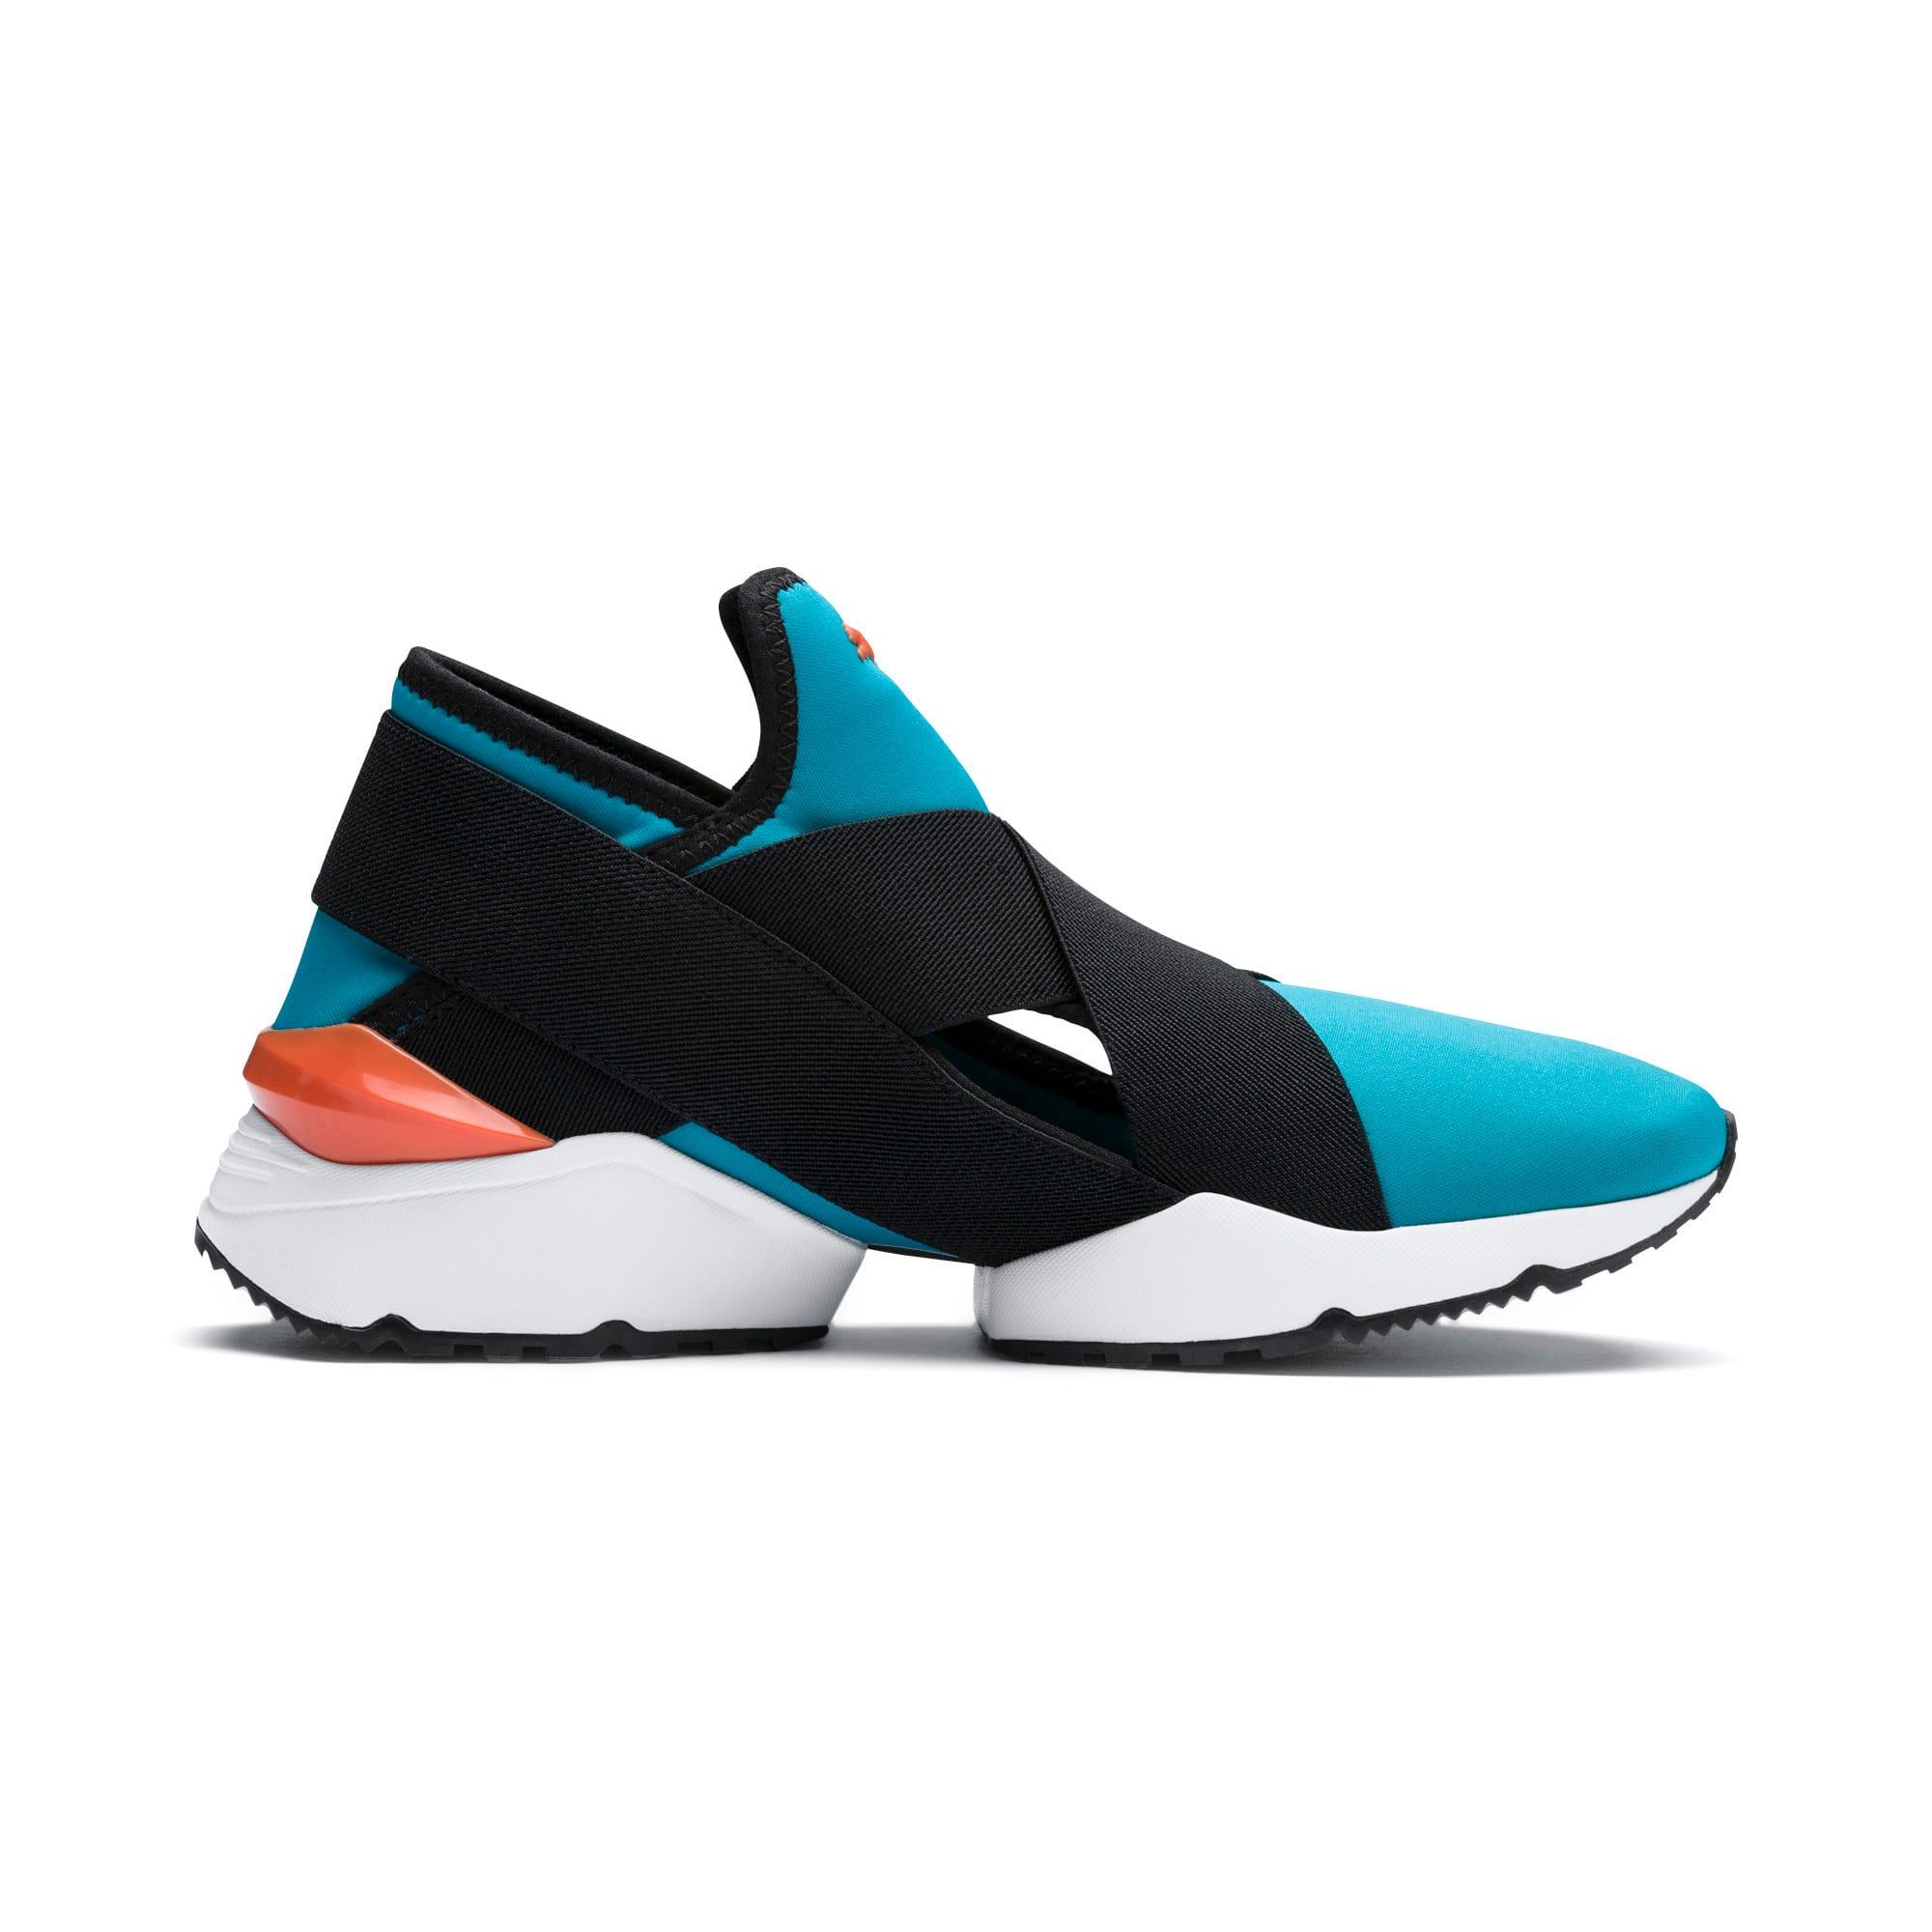 Thumbnail 6 of Muse 2 EOS Trailblazer Women's Sneakers, Caribbean Sea-Puma Black, medium